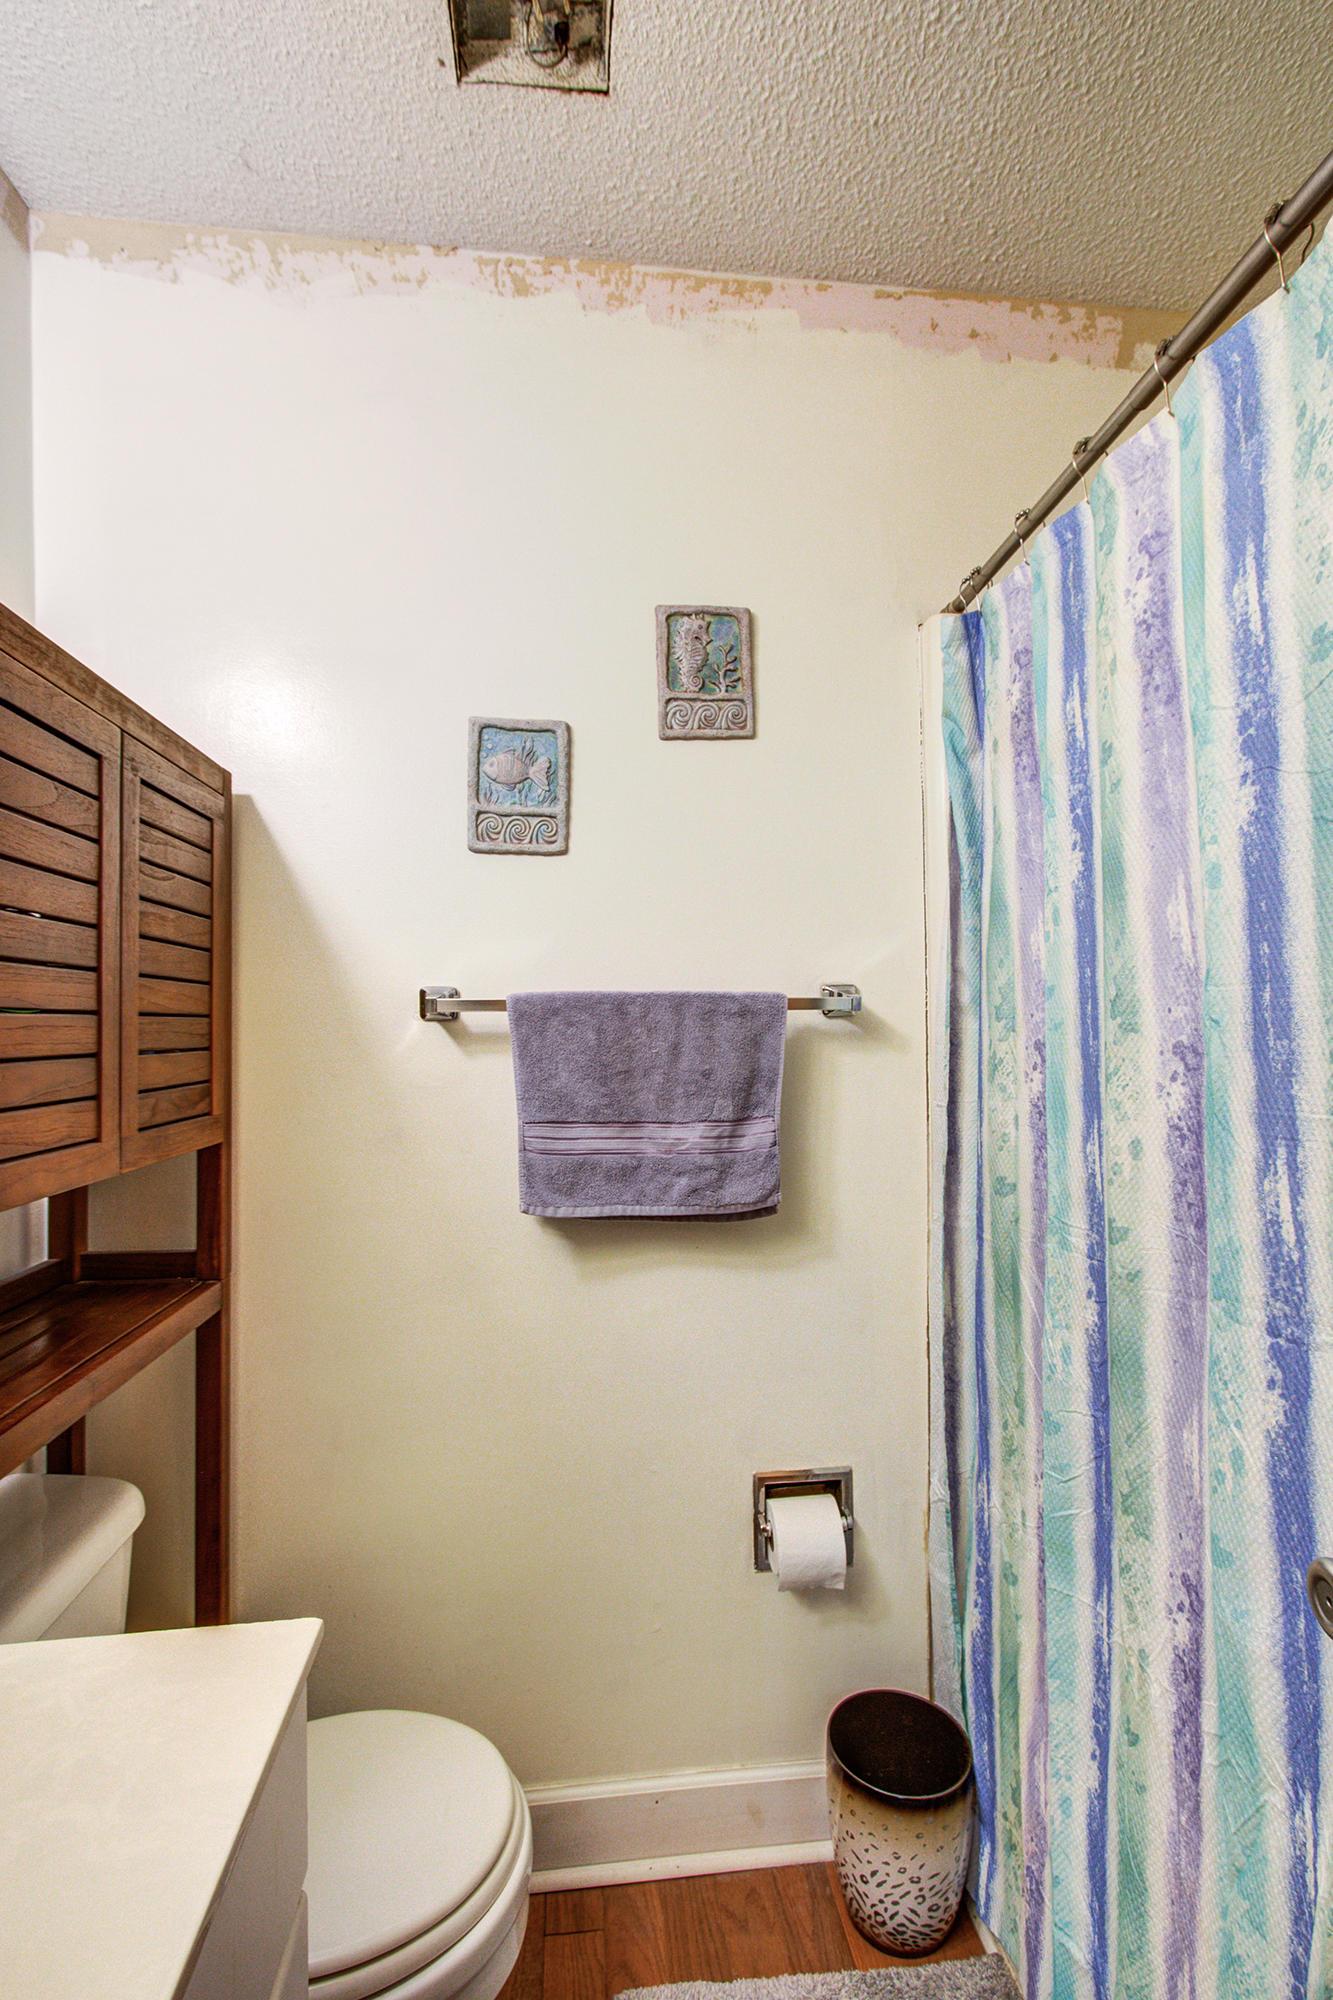 Wando Lakes Homes For Sale - 858 Fairlawn, Mount Pleasant, SC - 20